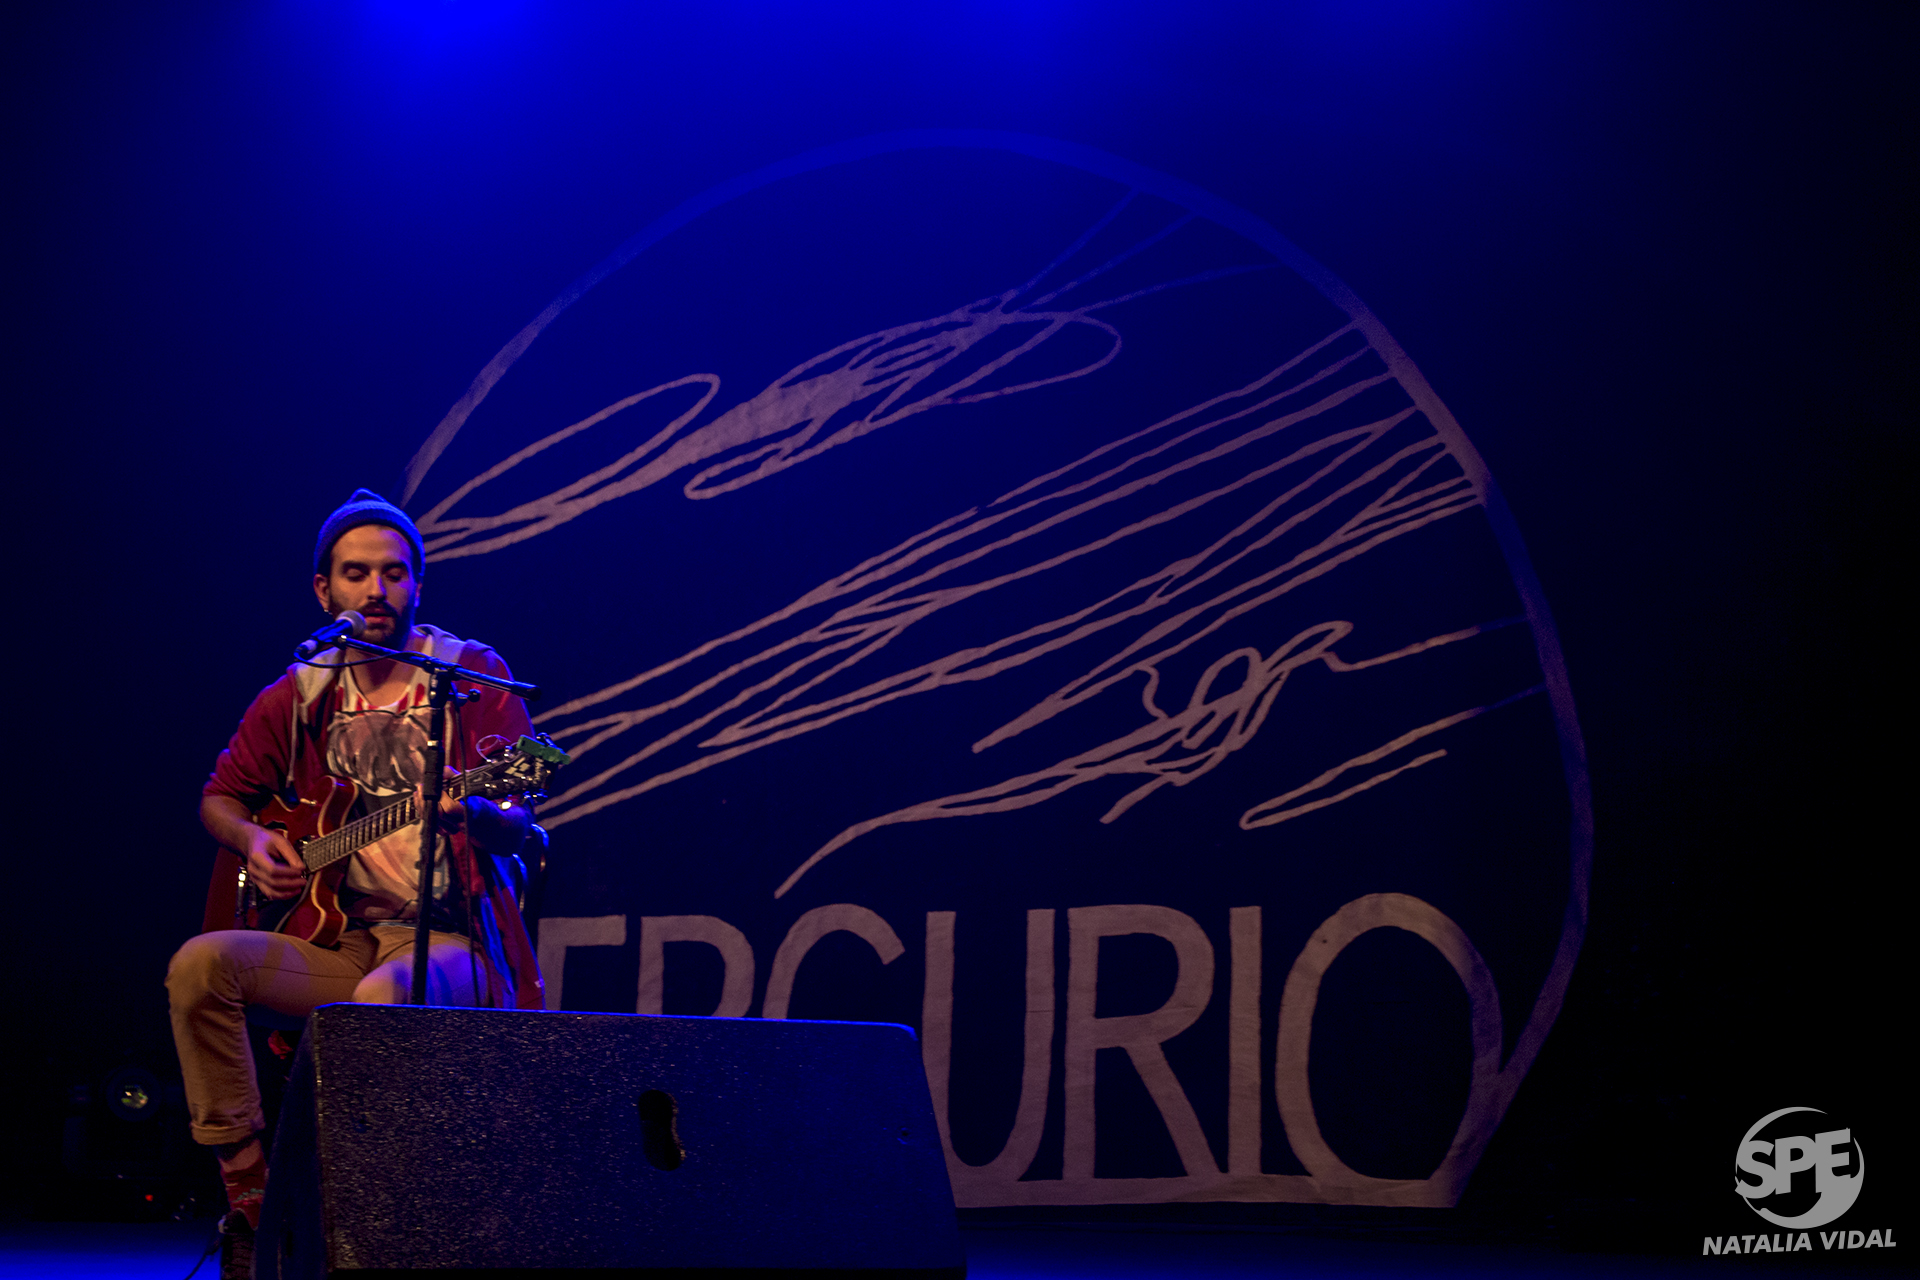 Mi-Amigo-Invencible-Festi-Mercurio-Teatro-Xirgu-30-06-18-Natalia-Vidal-Solo-Para-Entendidos_435.jpg